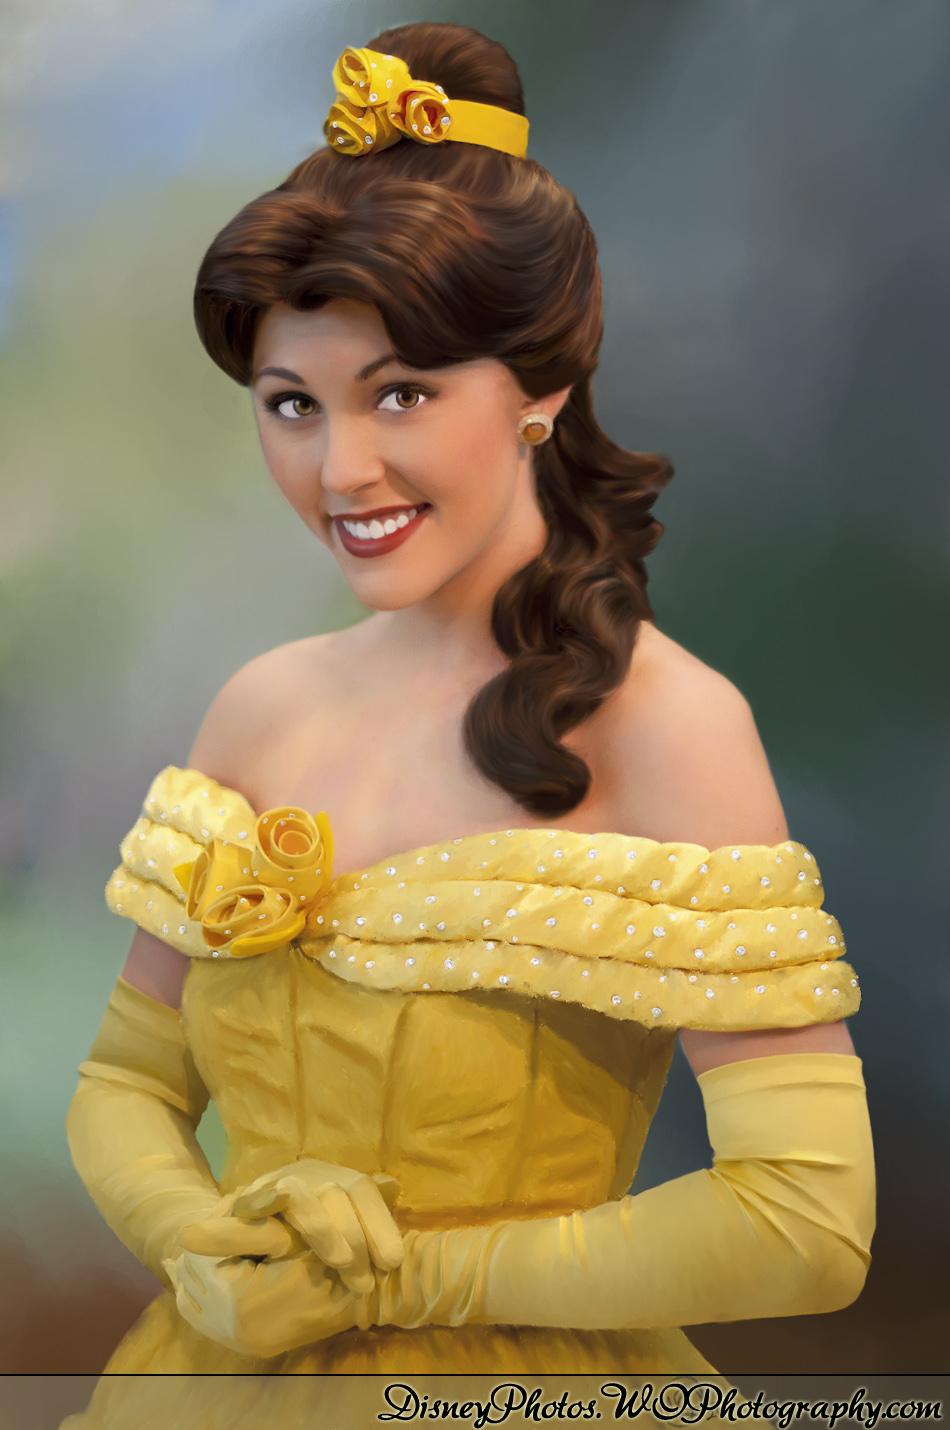 Photo Painting Disney Photo Blog